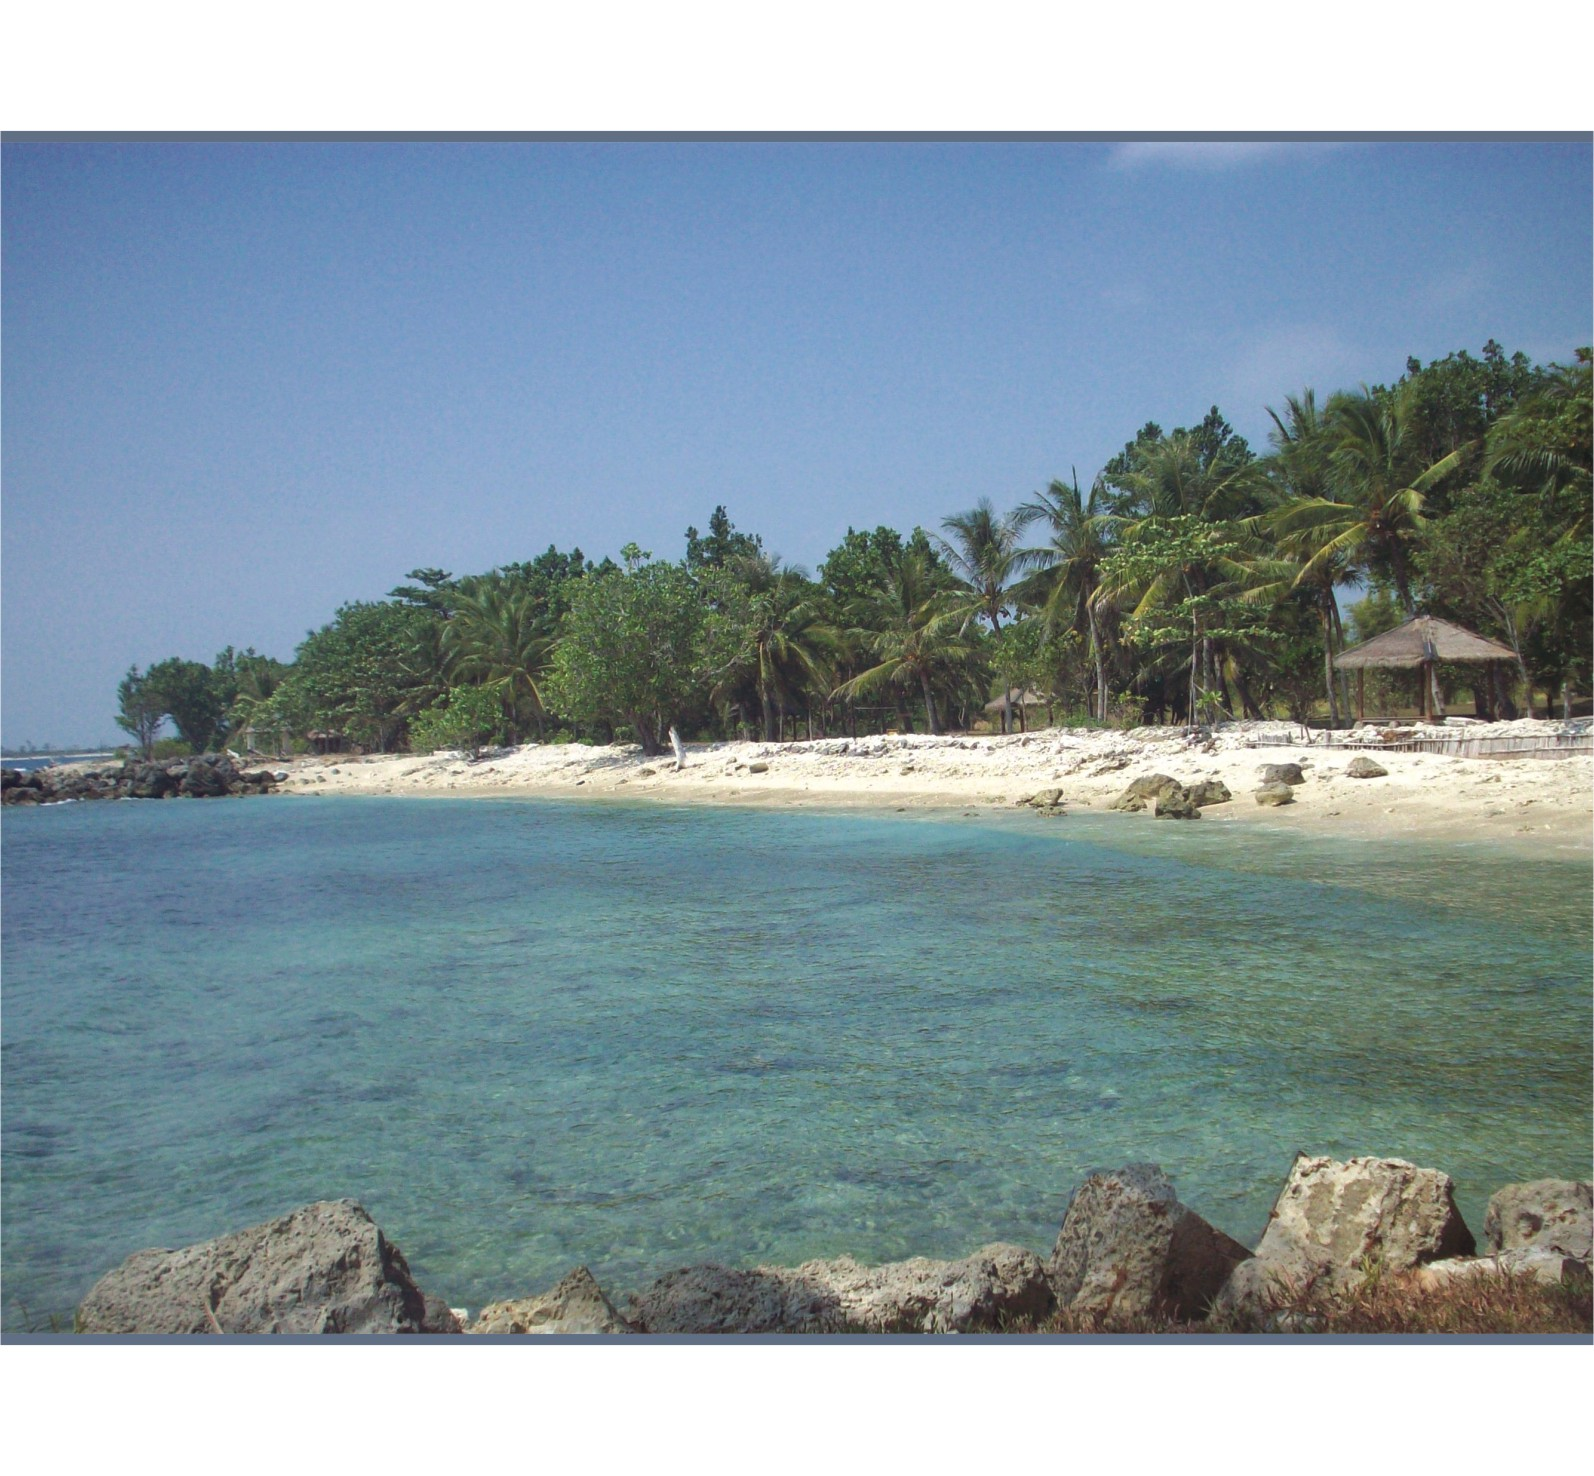 Beach Pandeglang Pesona Pantai Tanjung Lesung Ciputih Kab